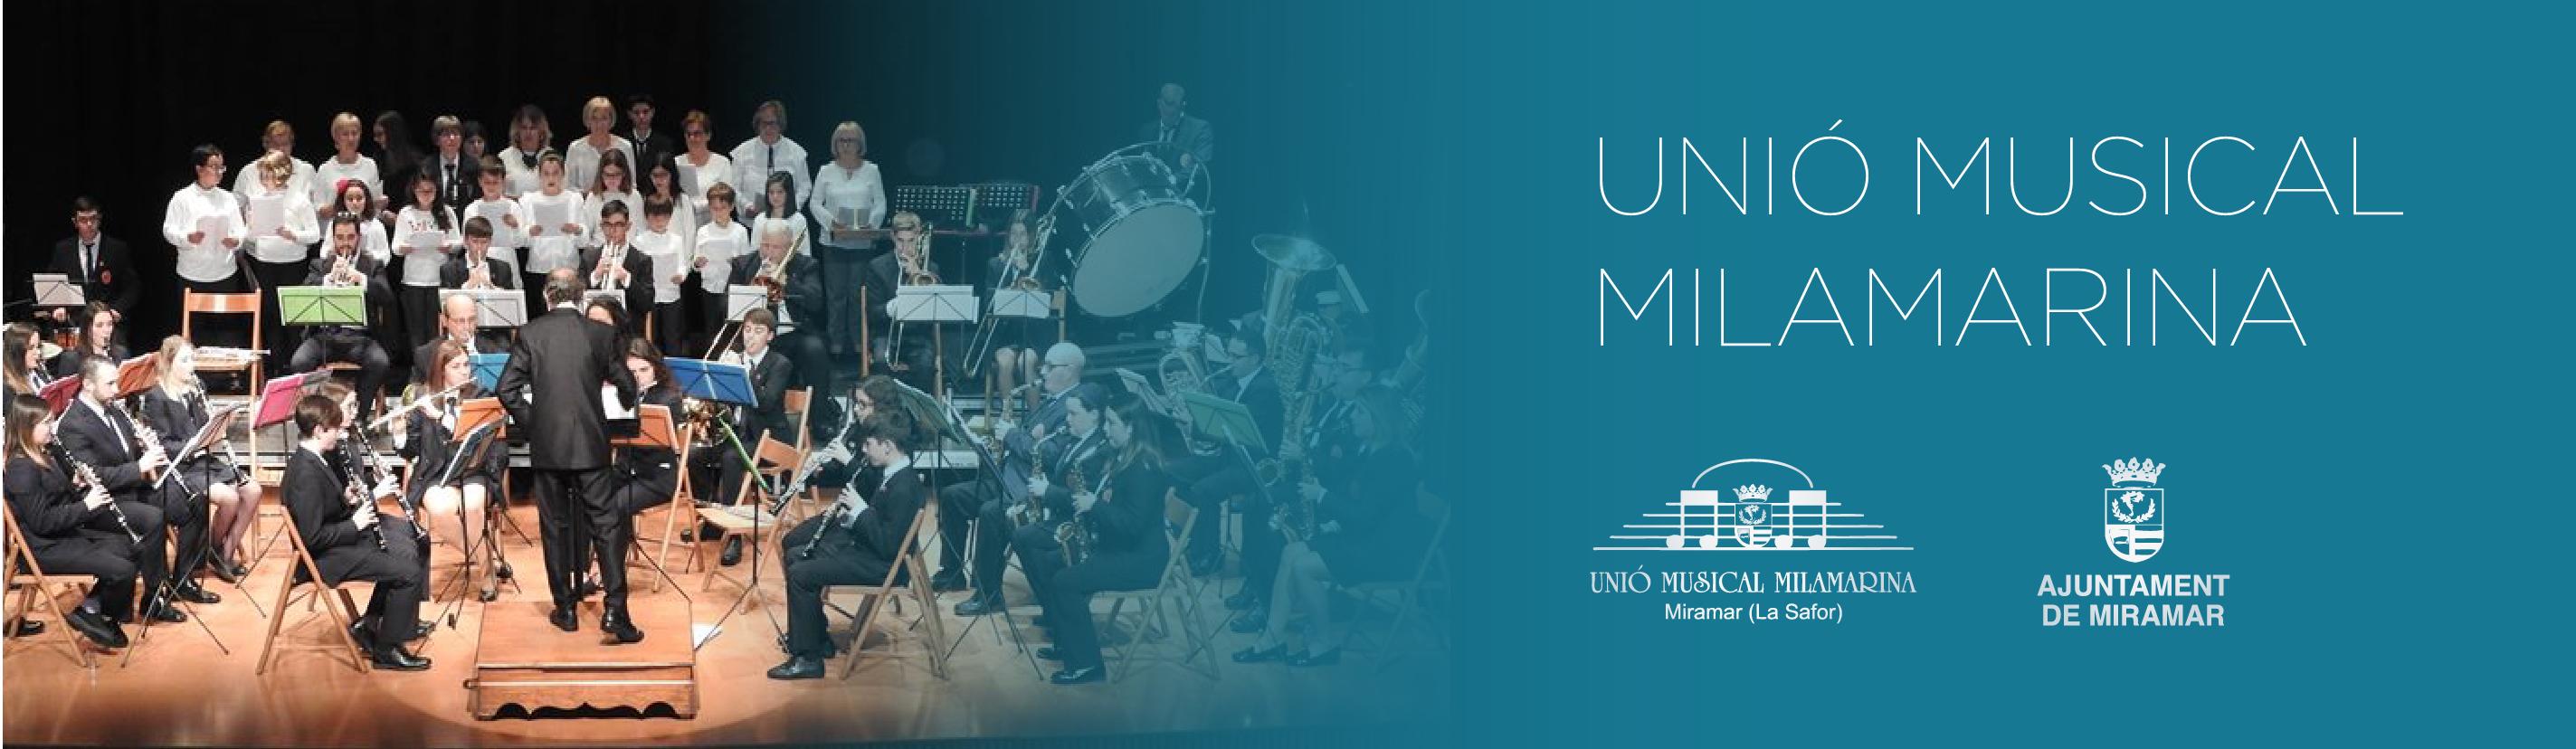 Unió Musical Milamarina - Societat Musical